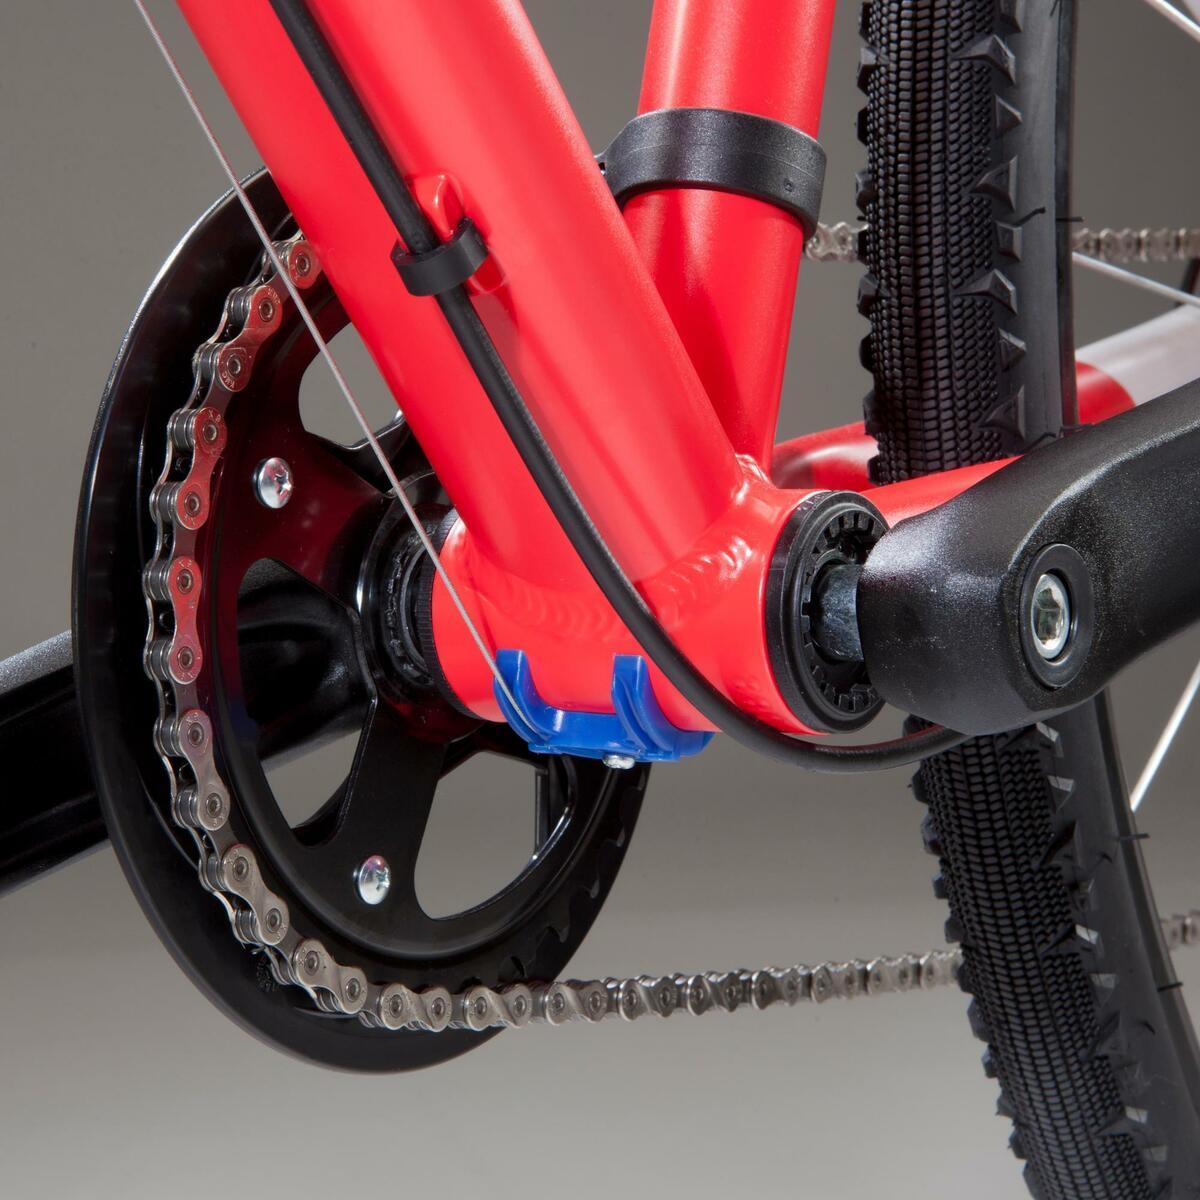 Bild 3 von Cross Bike 28 Riverside 500 Alu rot